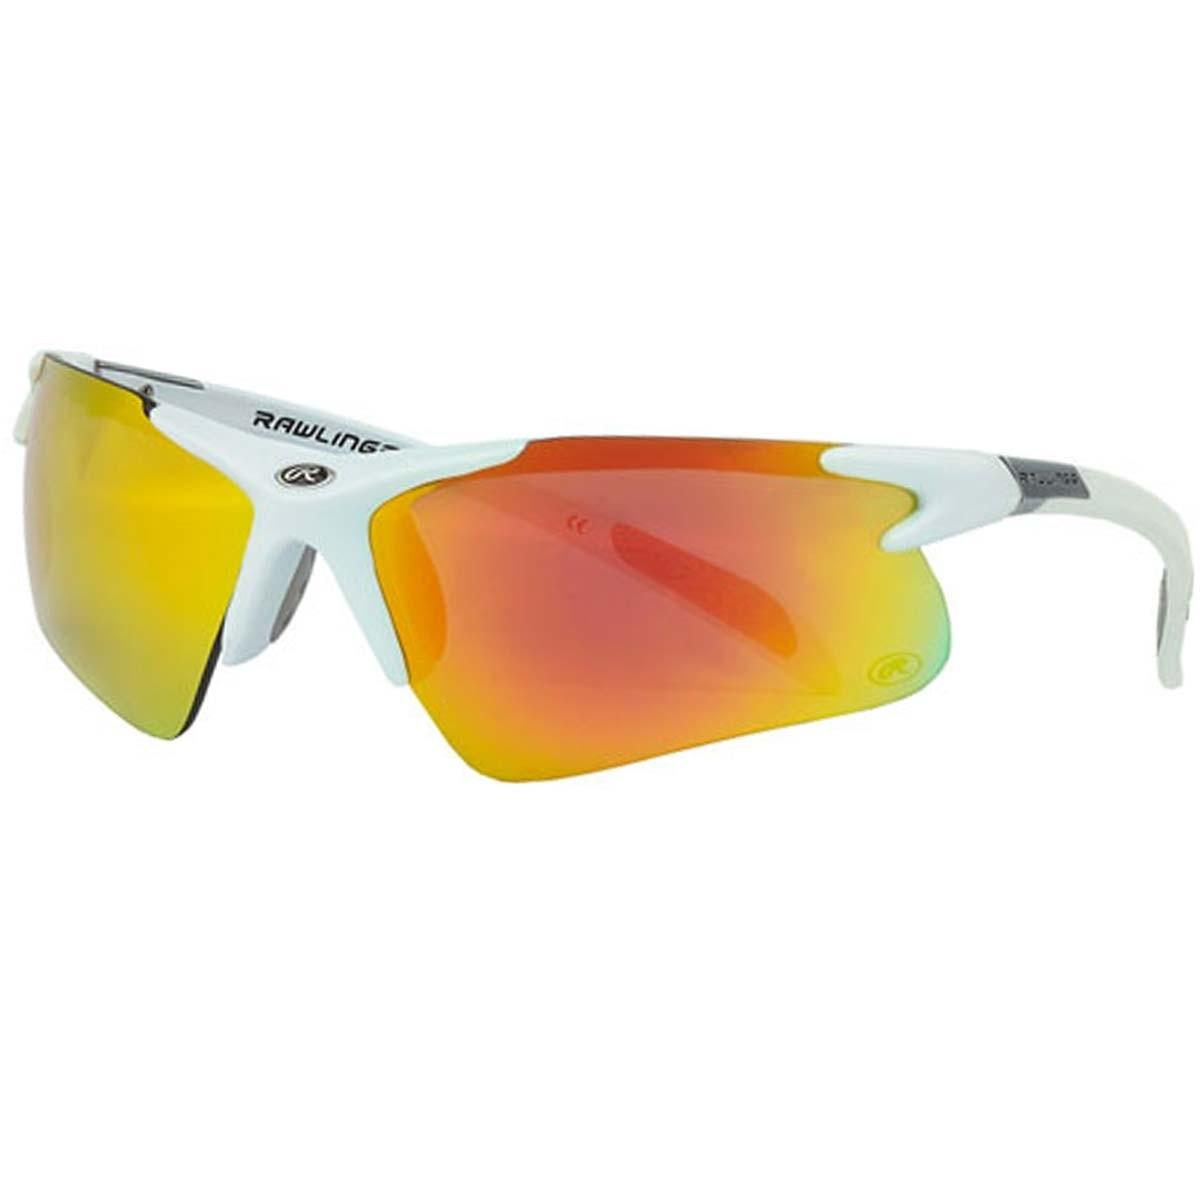 e0801cd9051 Rawlings Adult Sunglasses